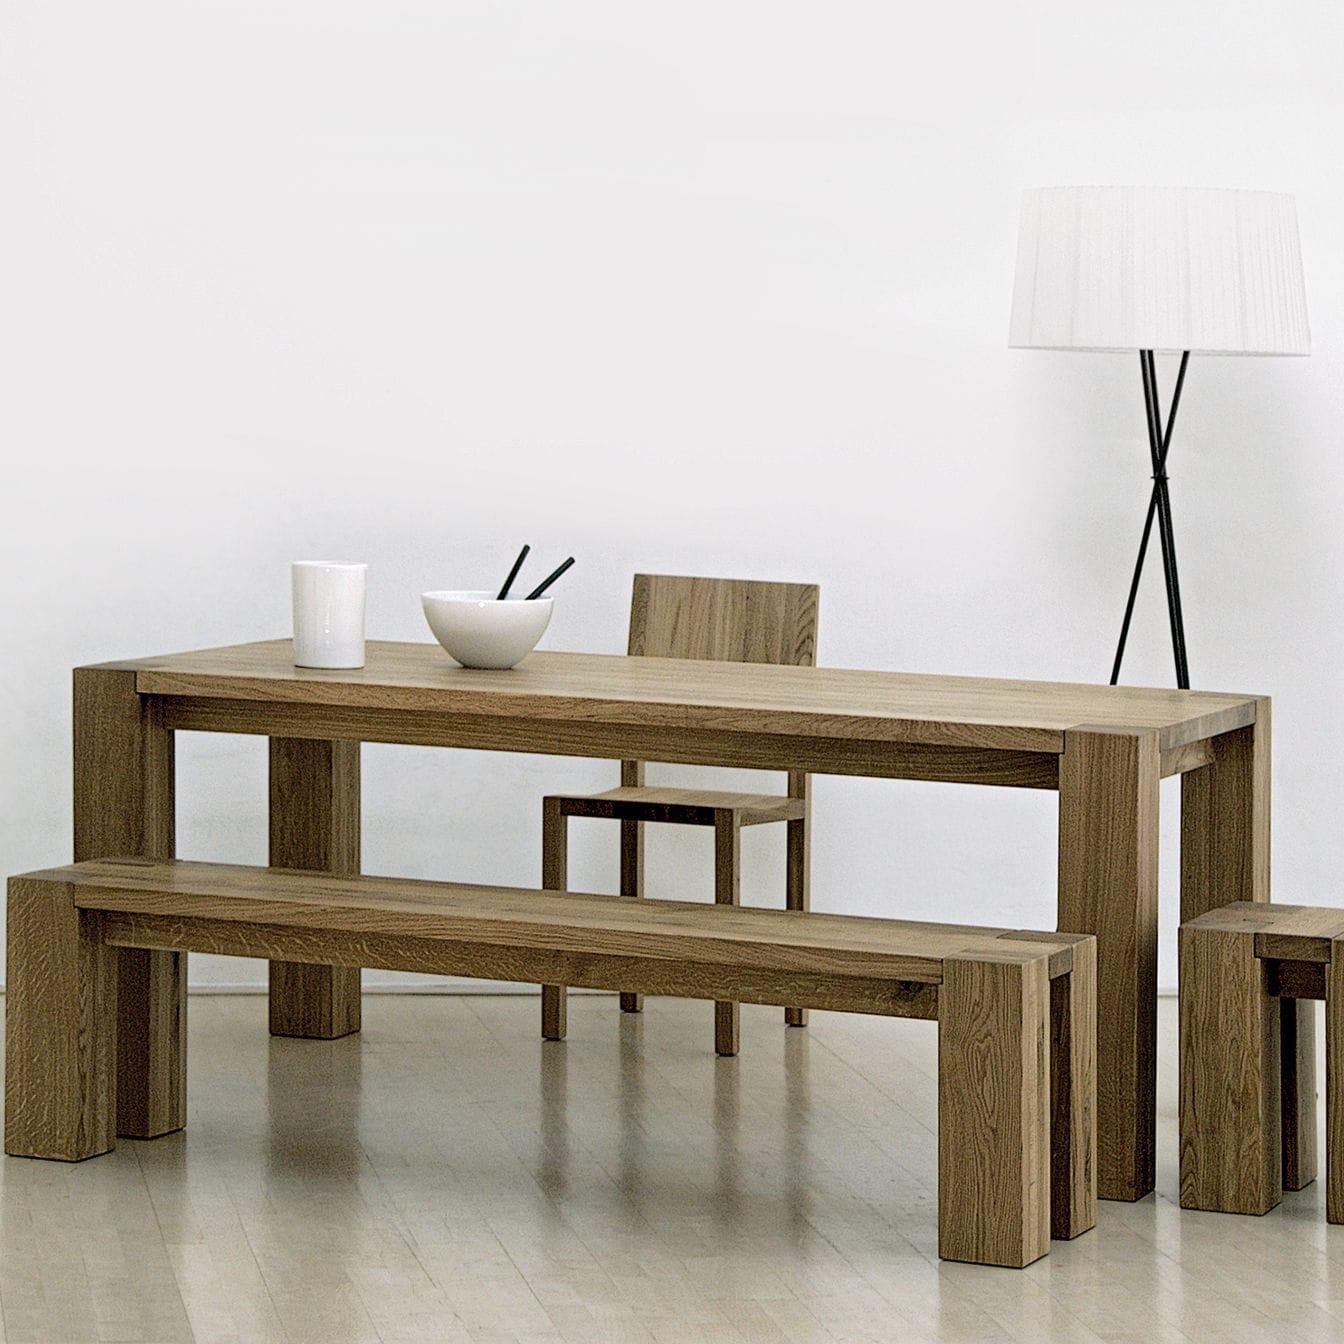 mesa de diseo bauhaus de madera maciza rectangular de interior taurus vitamin design